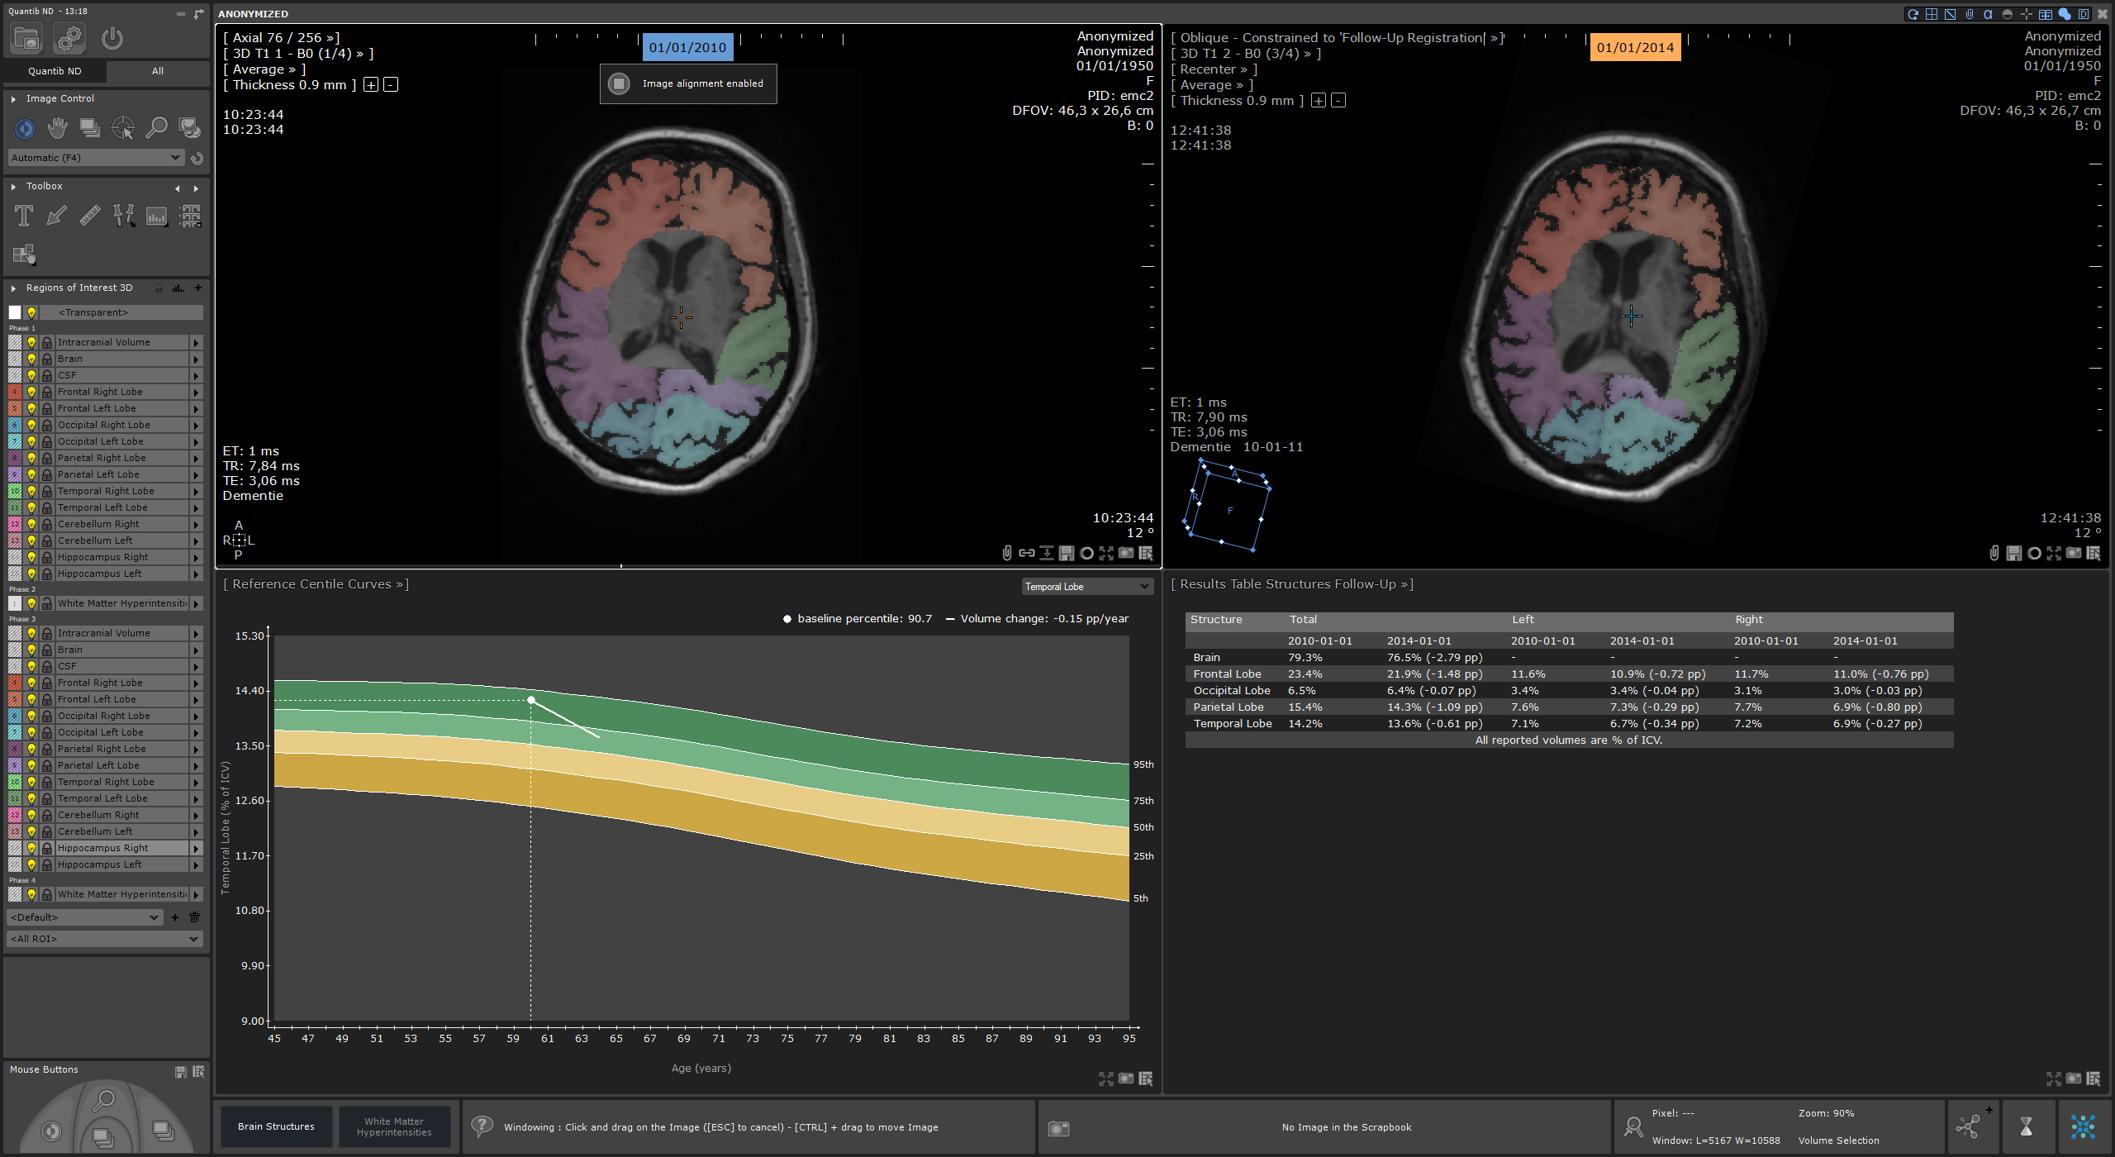 QND 1.5 lobes longitudinal